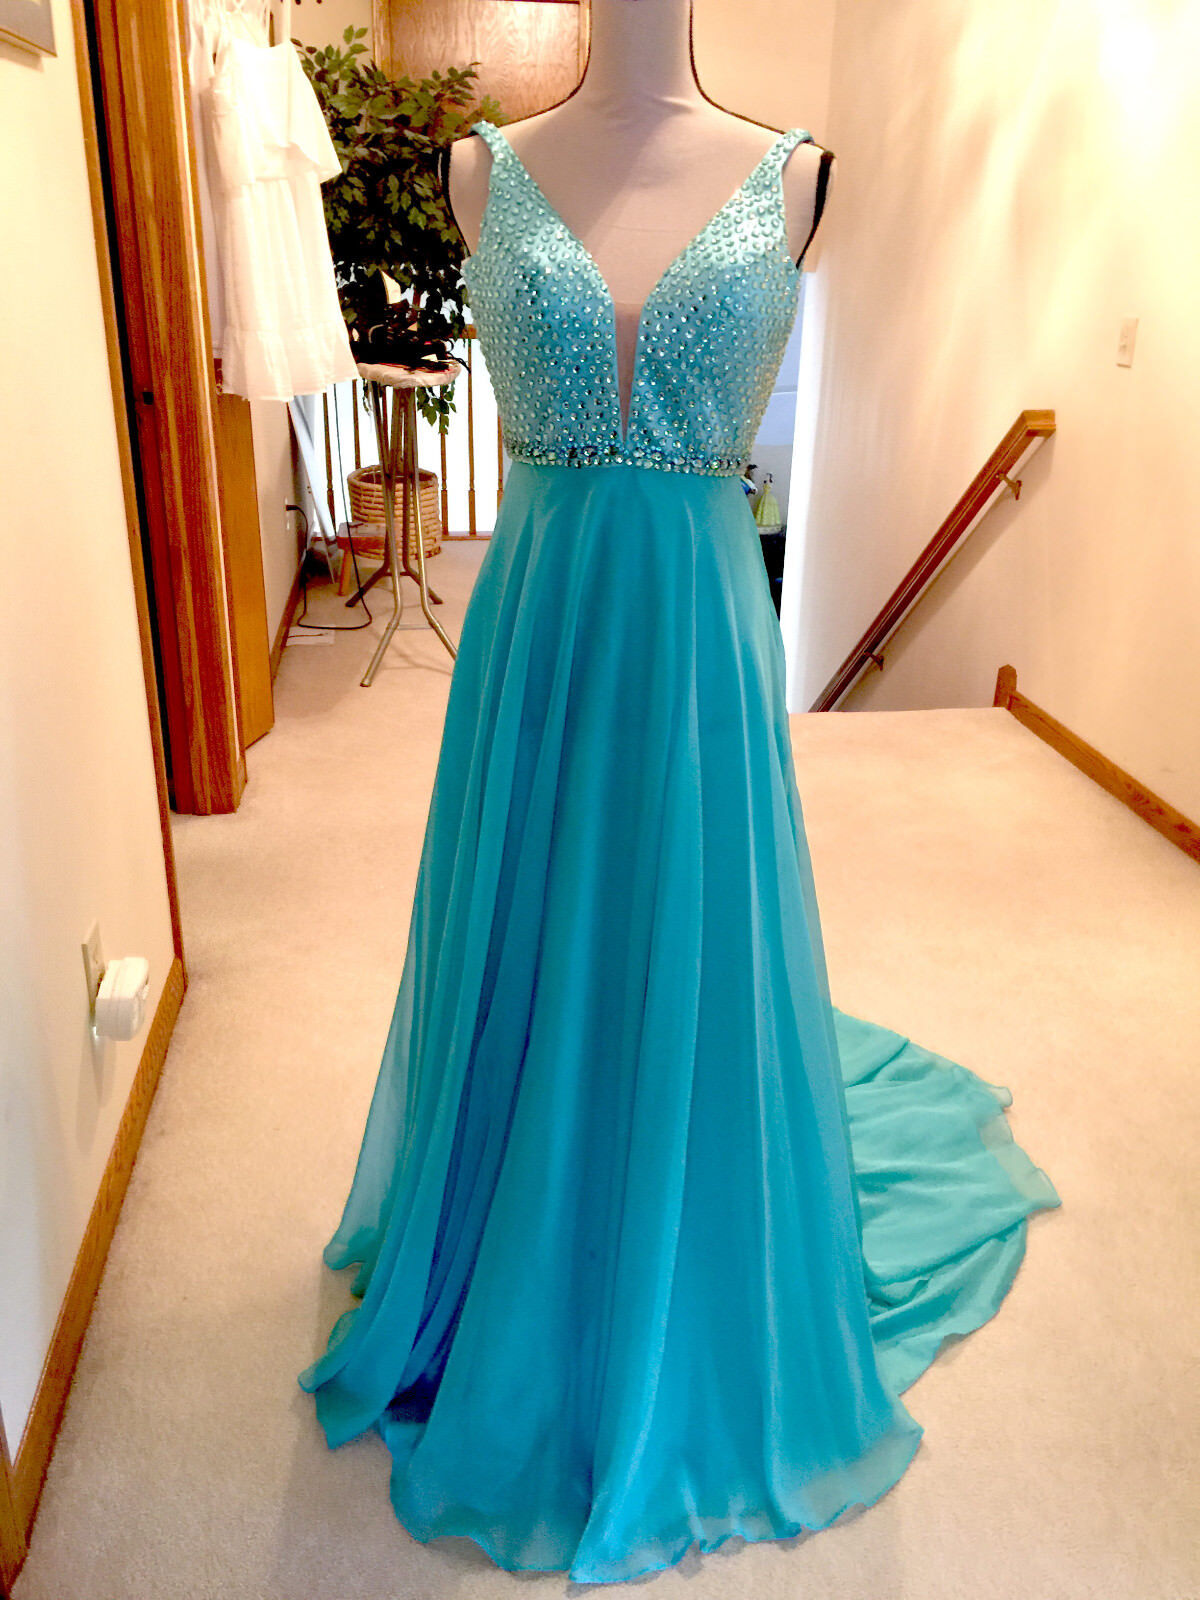 Sherri Sherri Sherri Hill Gown Prom or Pageant Size 0  blueee Teal Dress 53426c